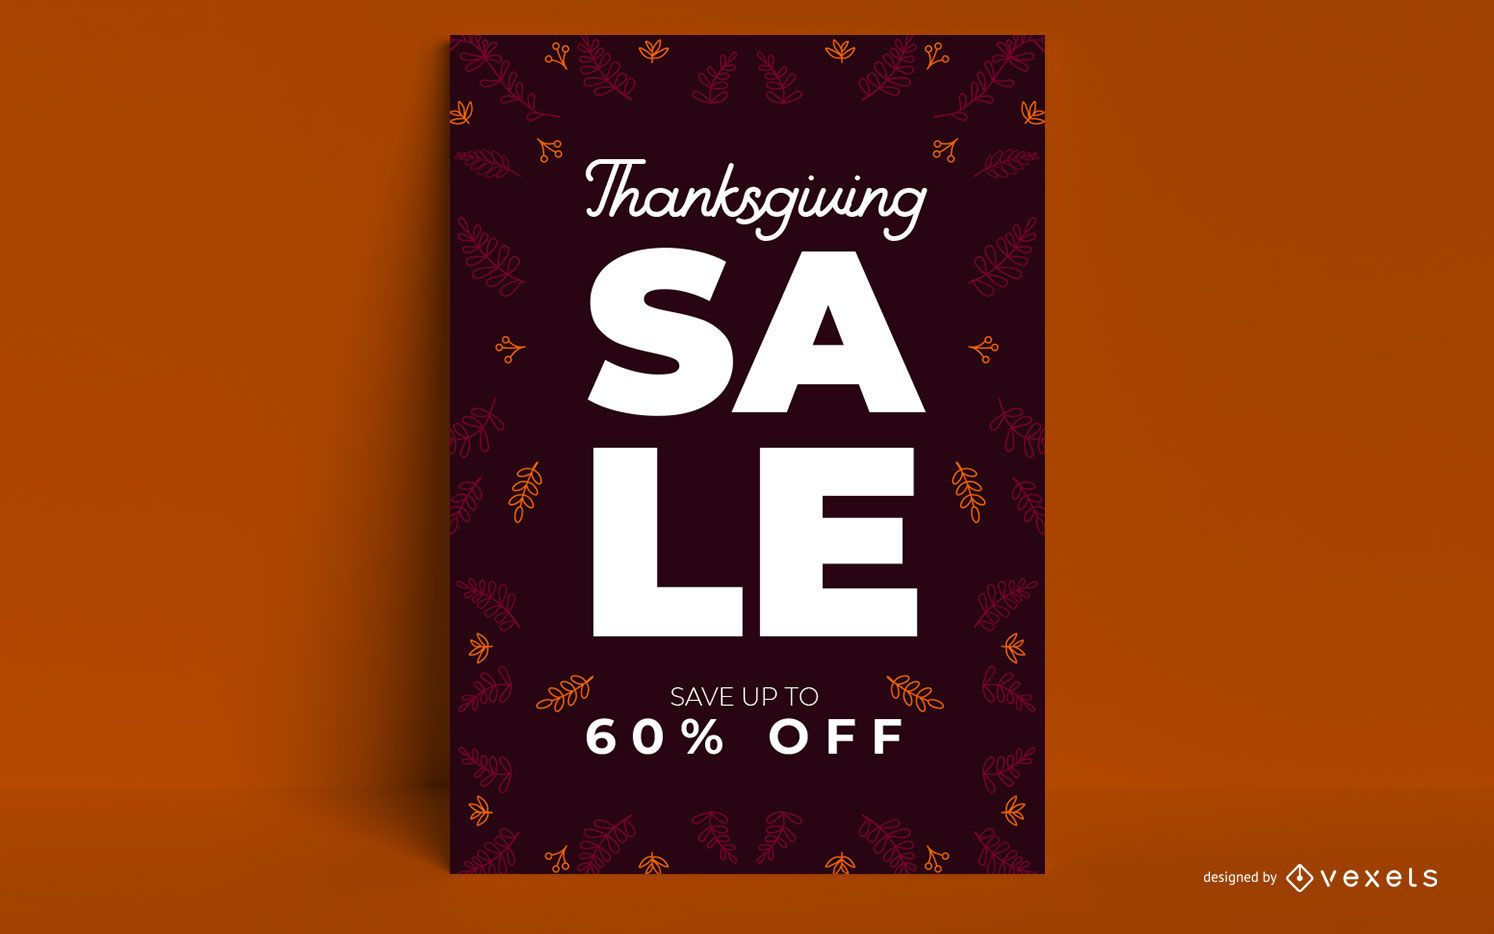 Thanksgiving Sale Poster Design